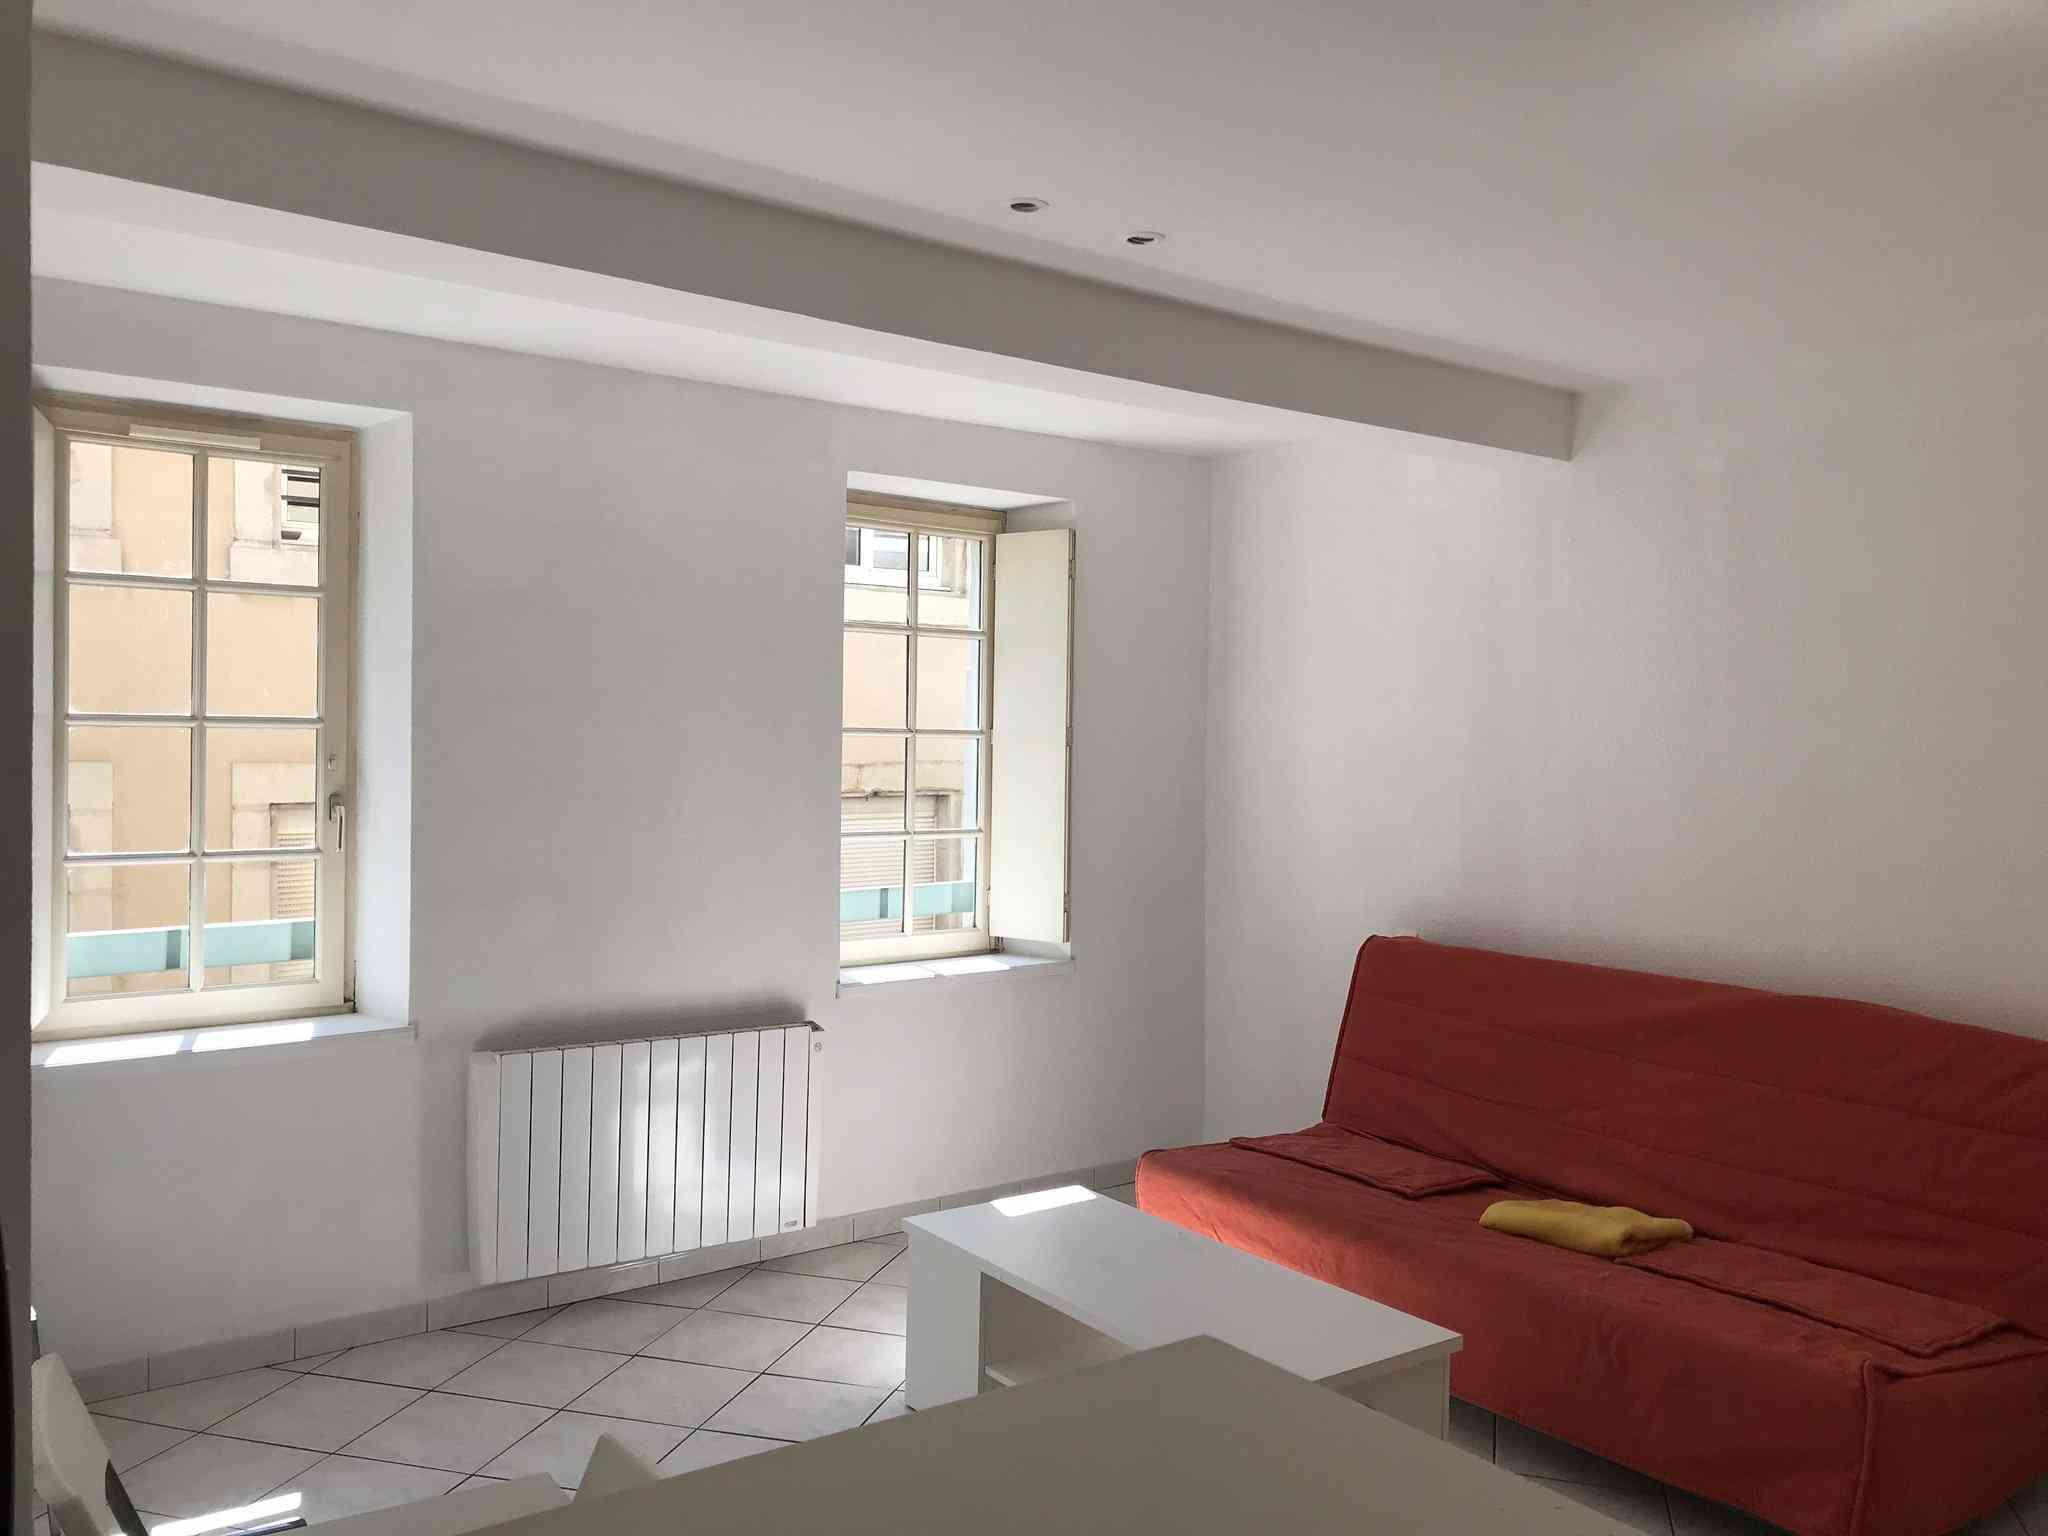 Apartment CARCASSONNE | 310 € / month